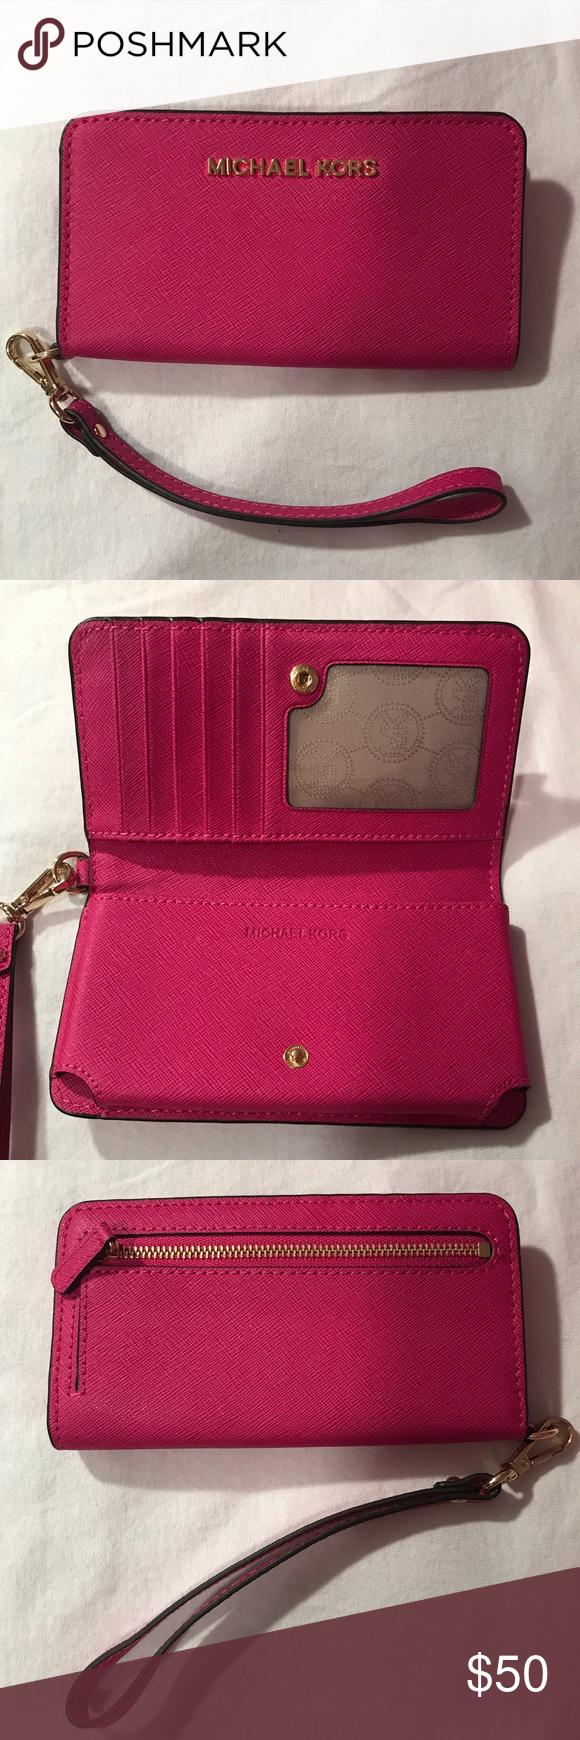 michael kors smartphone wristlet hot pink michael kors